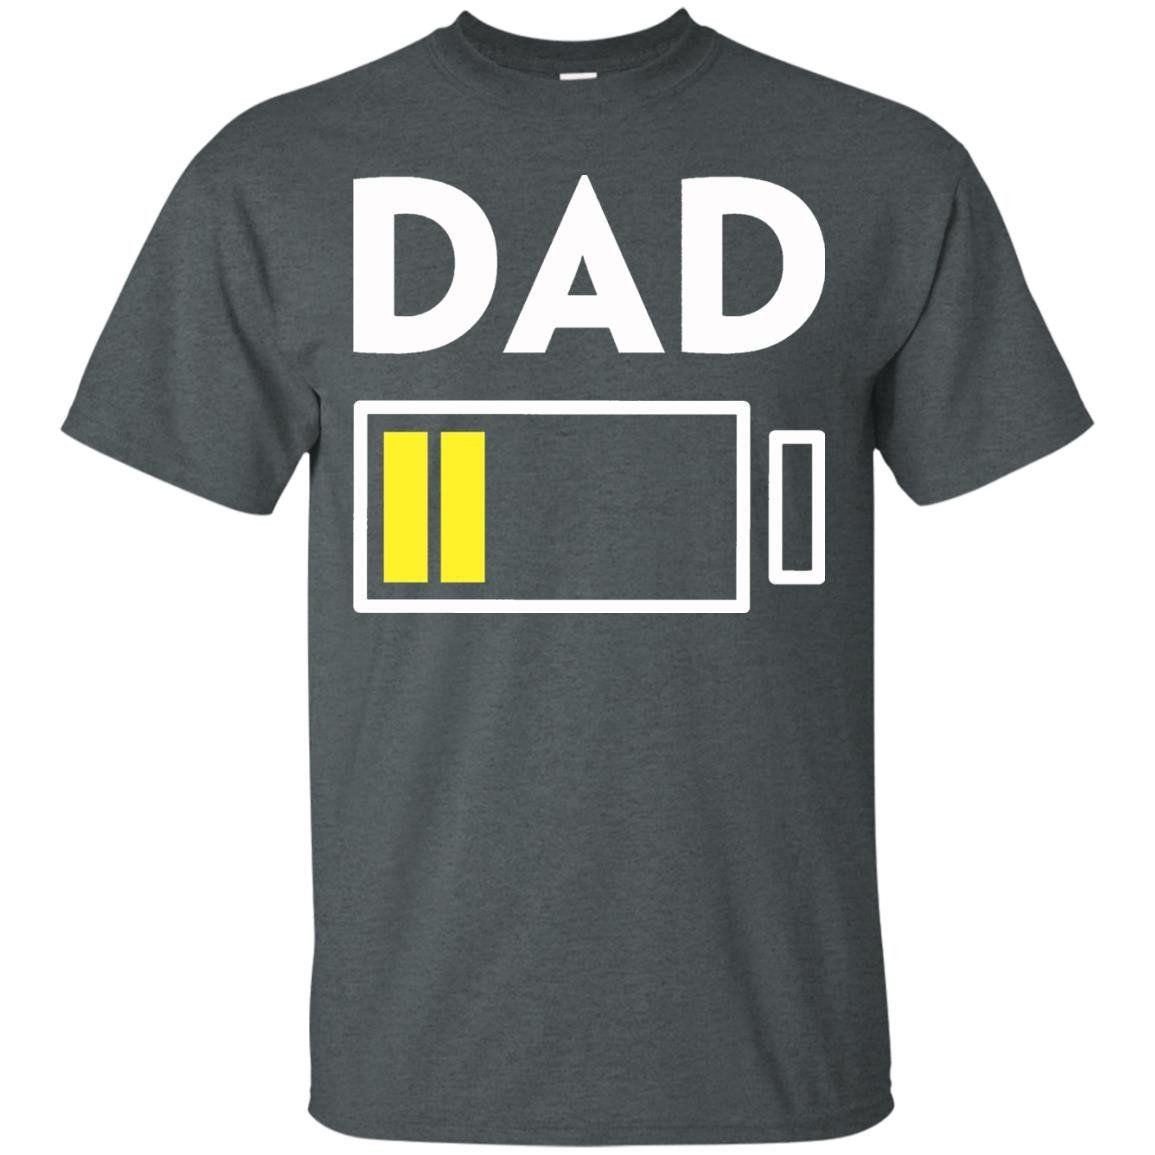 Dad Full Battery Energy T-Shirt